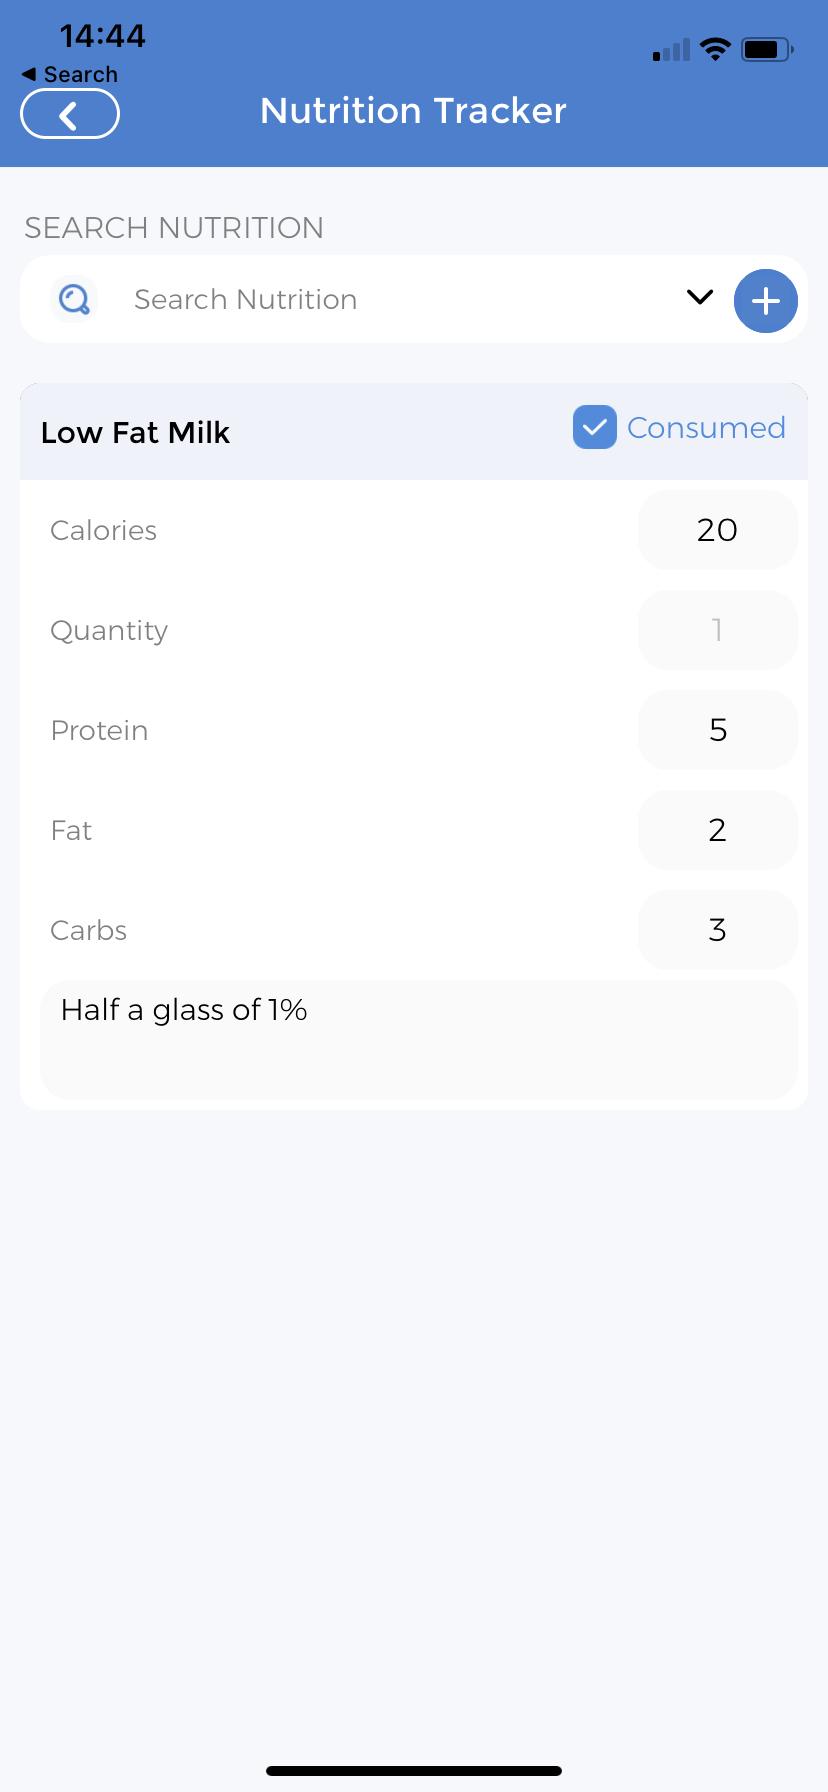 Nutritional Tracker